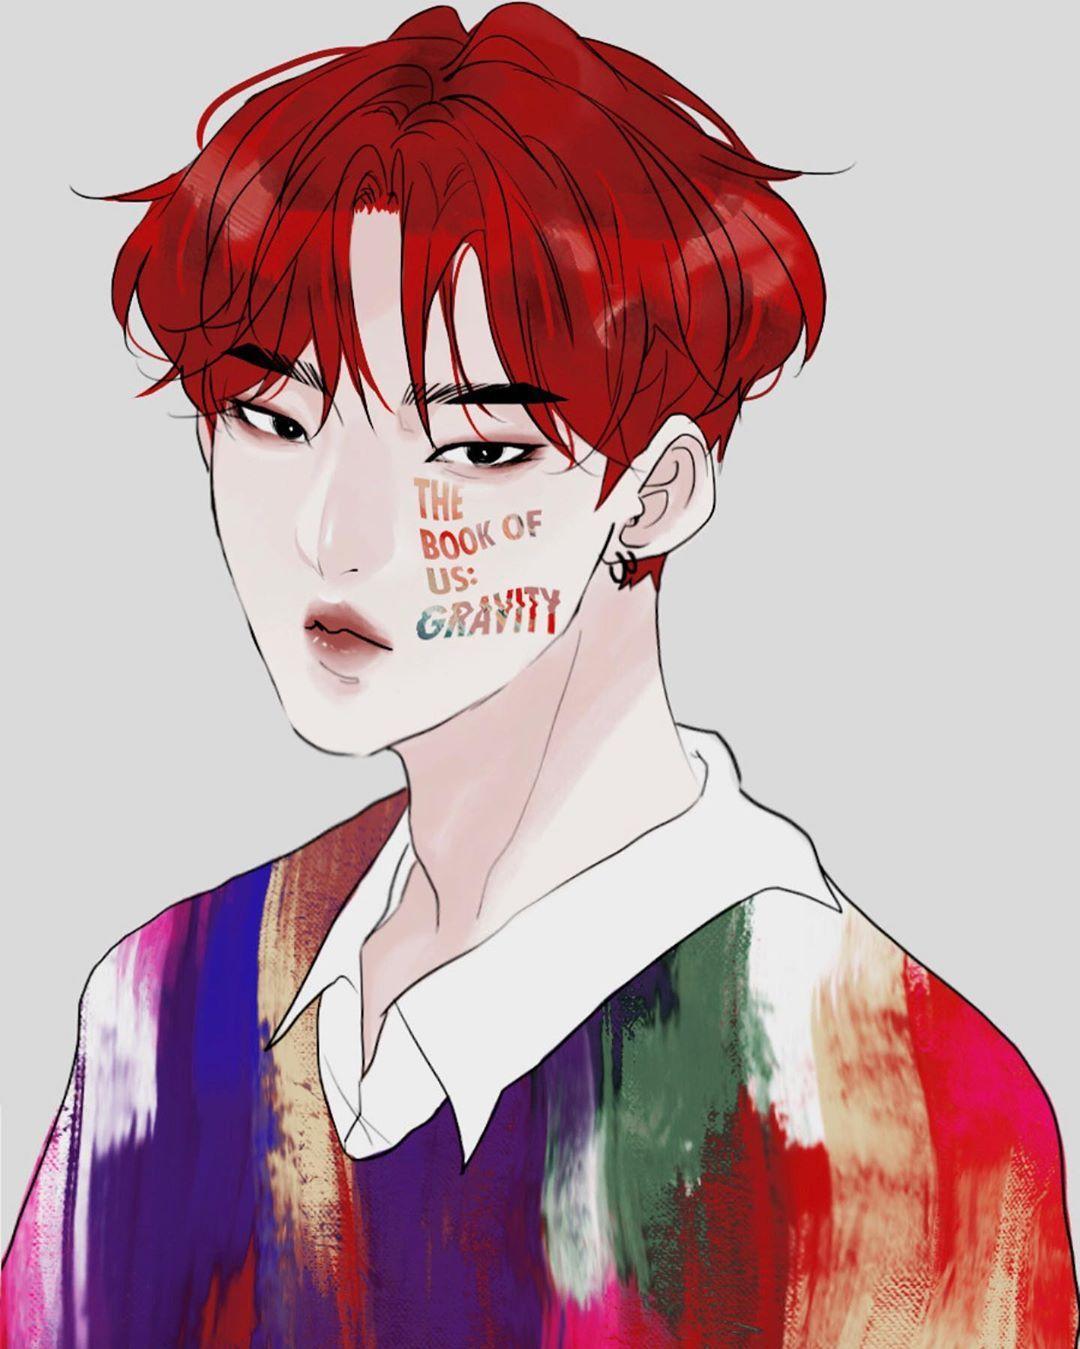 Jjolee Ok Webcomic Artist On Instagram Why Do I Keep Drawing Boys With Red Hair Day6fanart Day6 Youngk Butactuallybr Kpop Fanart Fan Art Drawings